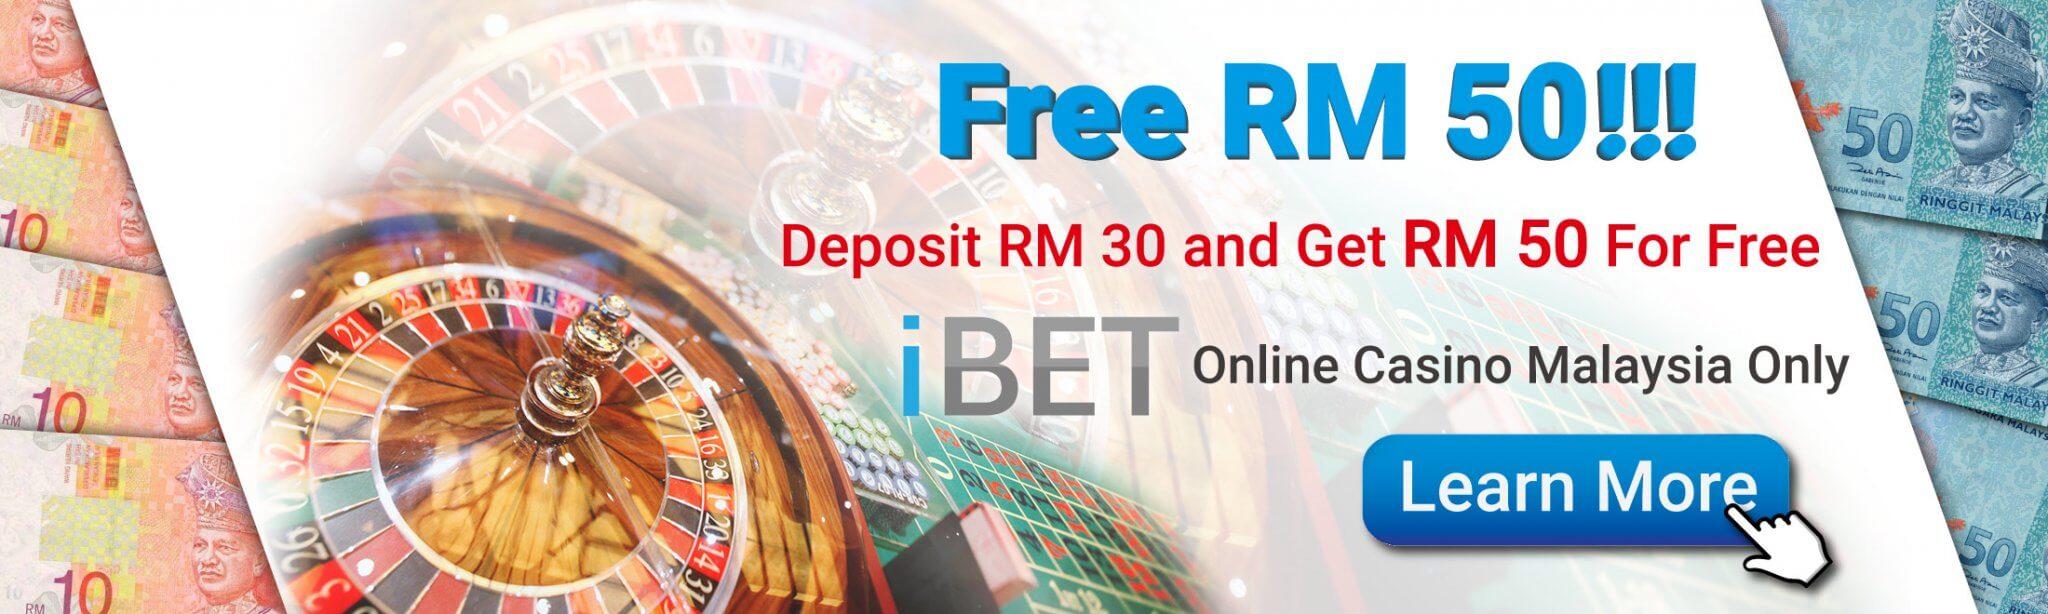 918Kiss(SCR888) Login Casino Deposit RM30 Free RM50 in iBET Live Casino Malaysia